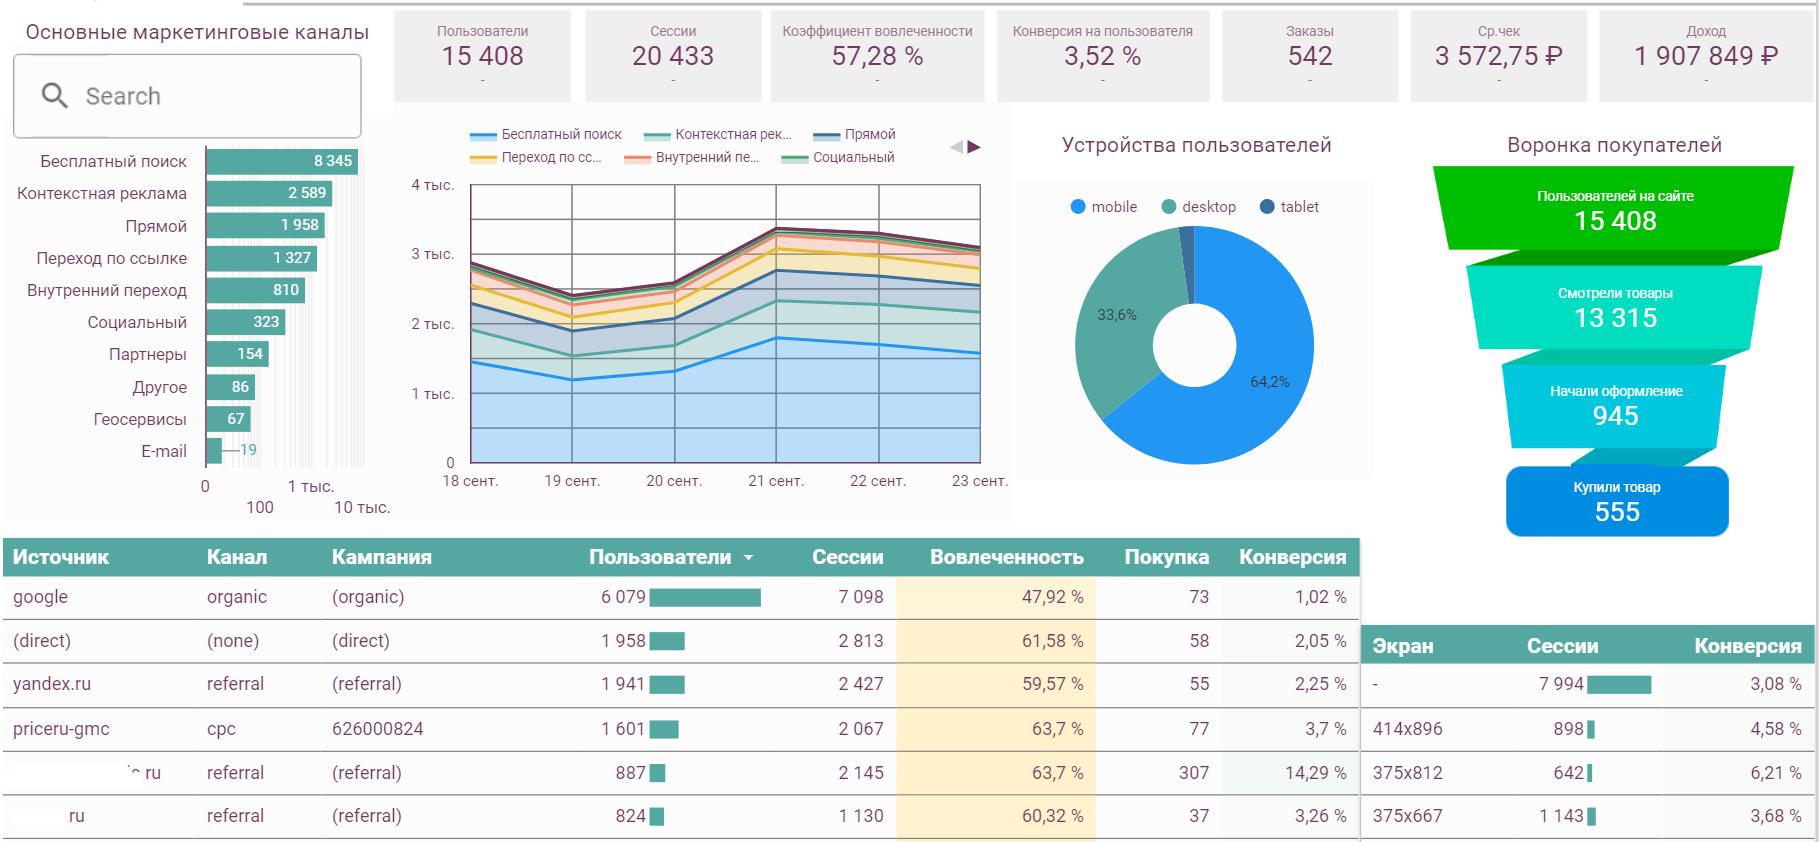 Отчет Google Data Studio